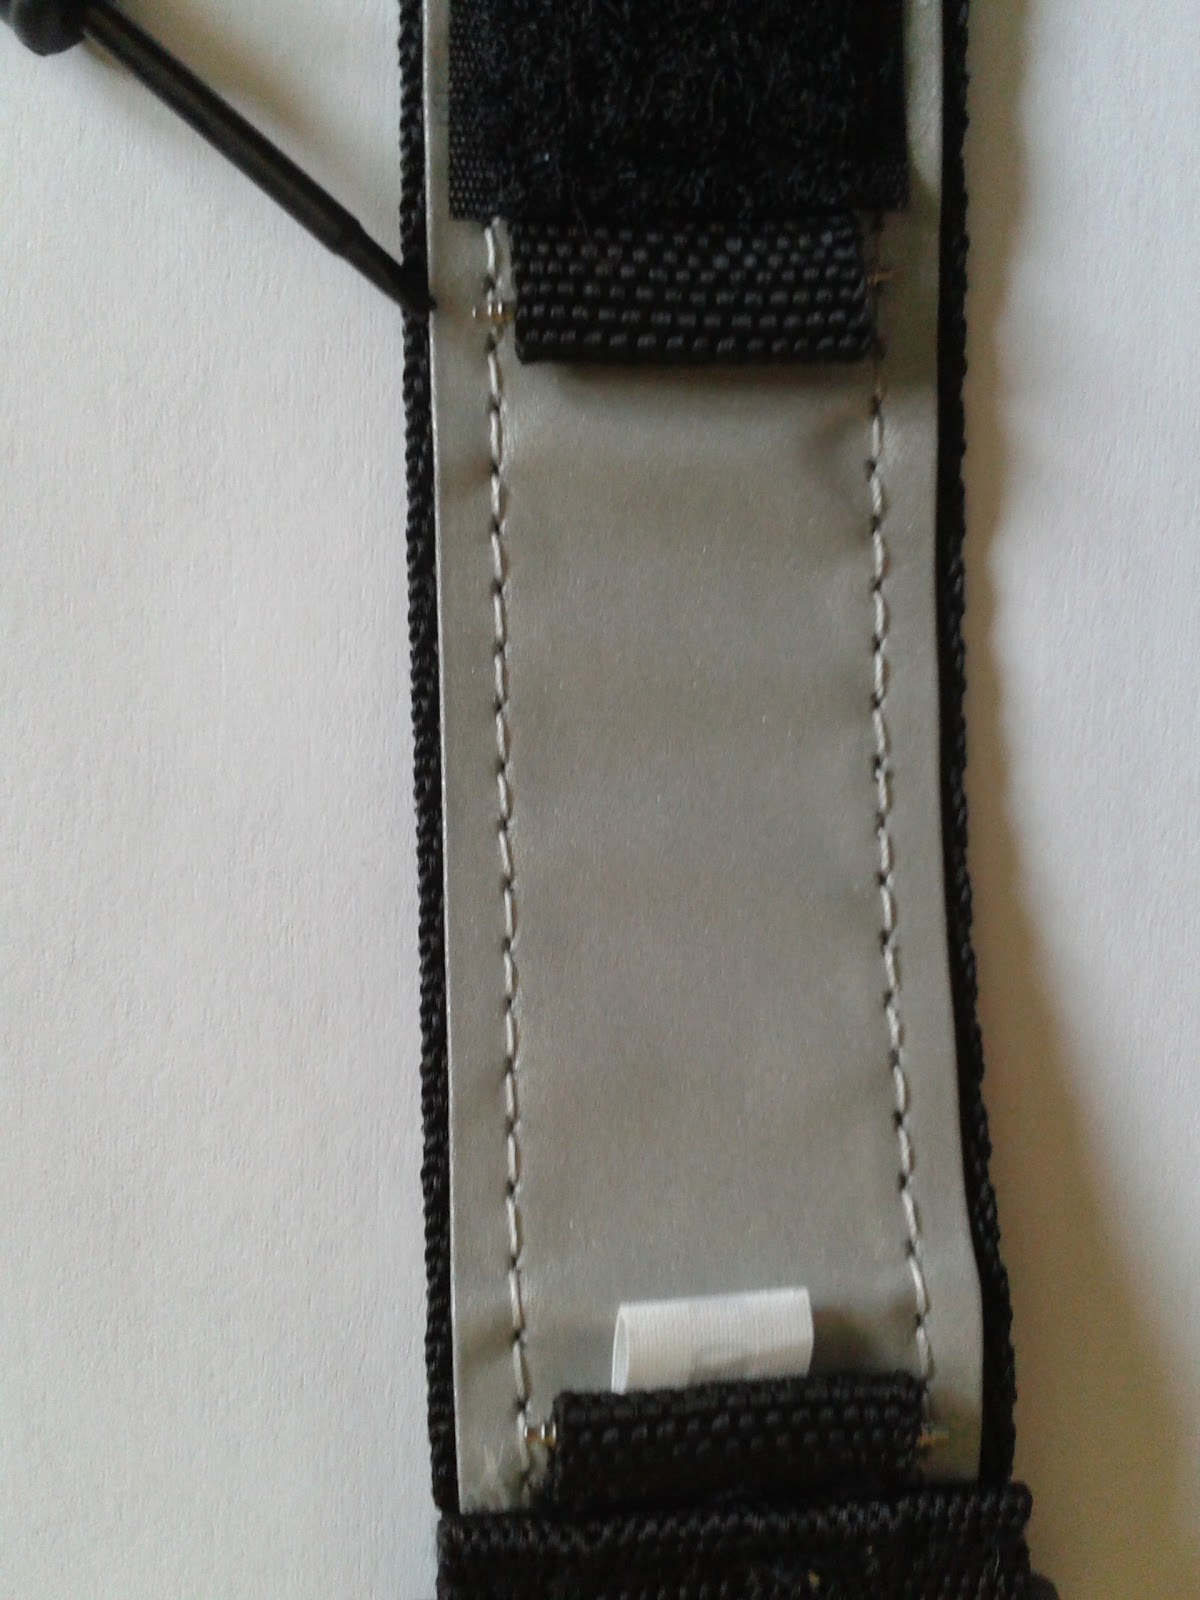 Garmin 405 wristband replacement